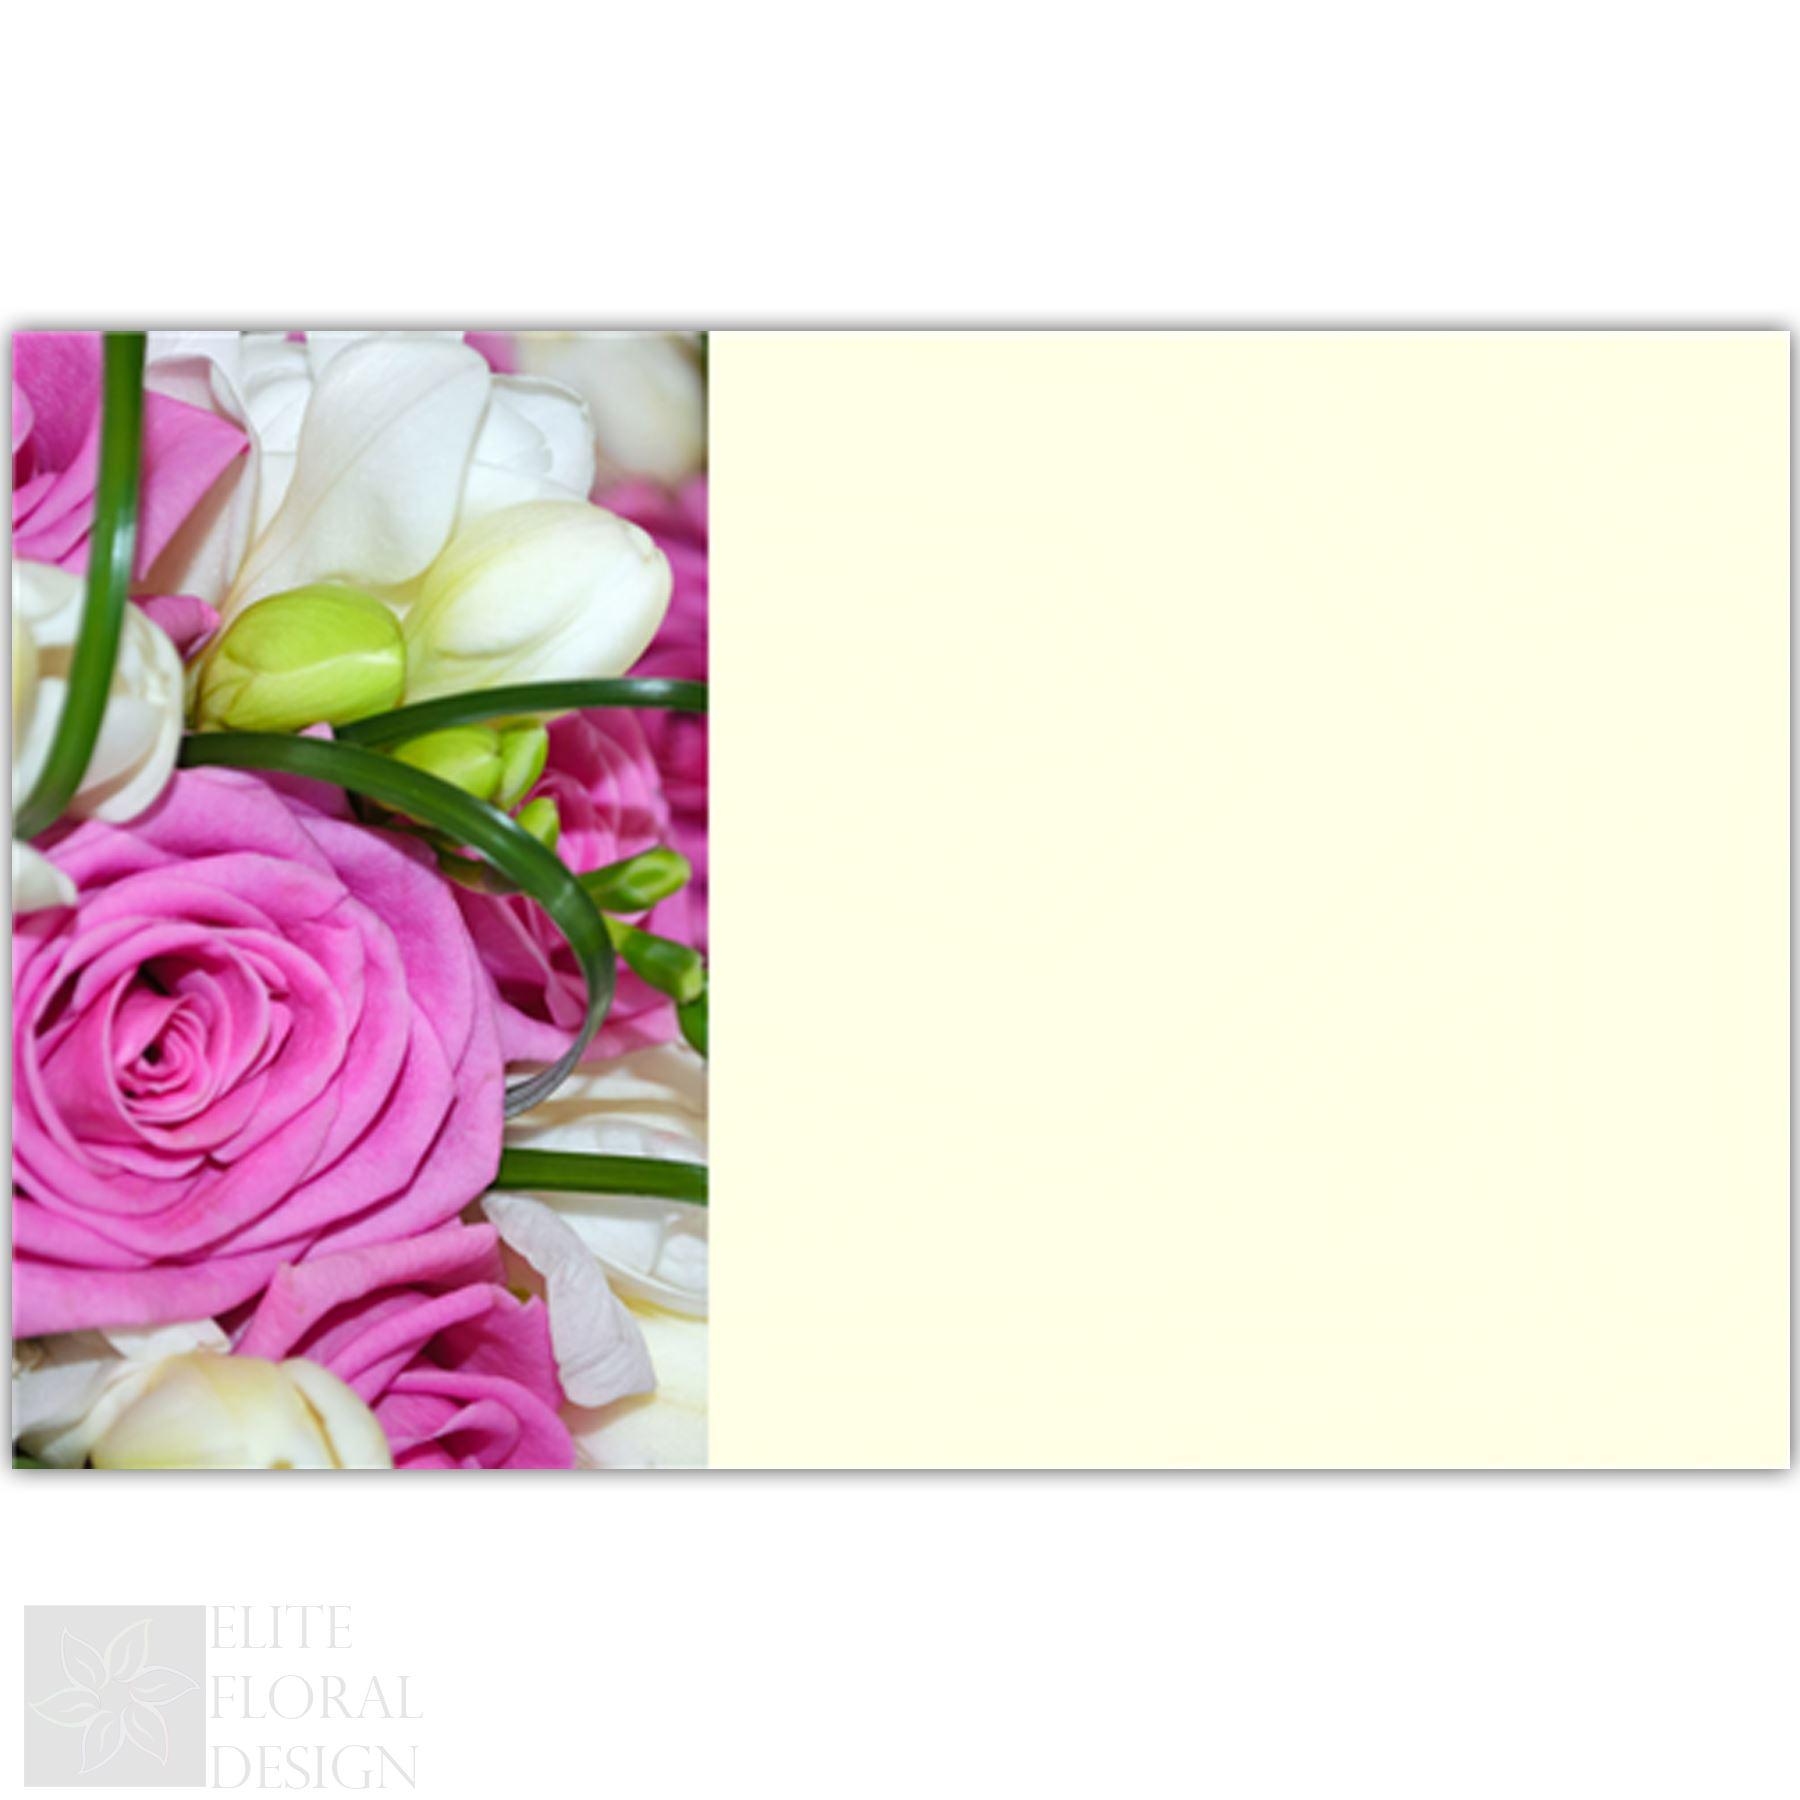 Florist flower message cards birthday annivesary funeral mothers day florist flower message cards birthday annivesary funeral mothers izmirmasajfo